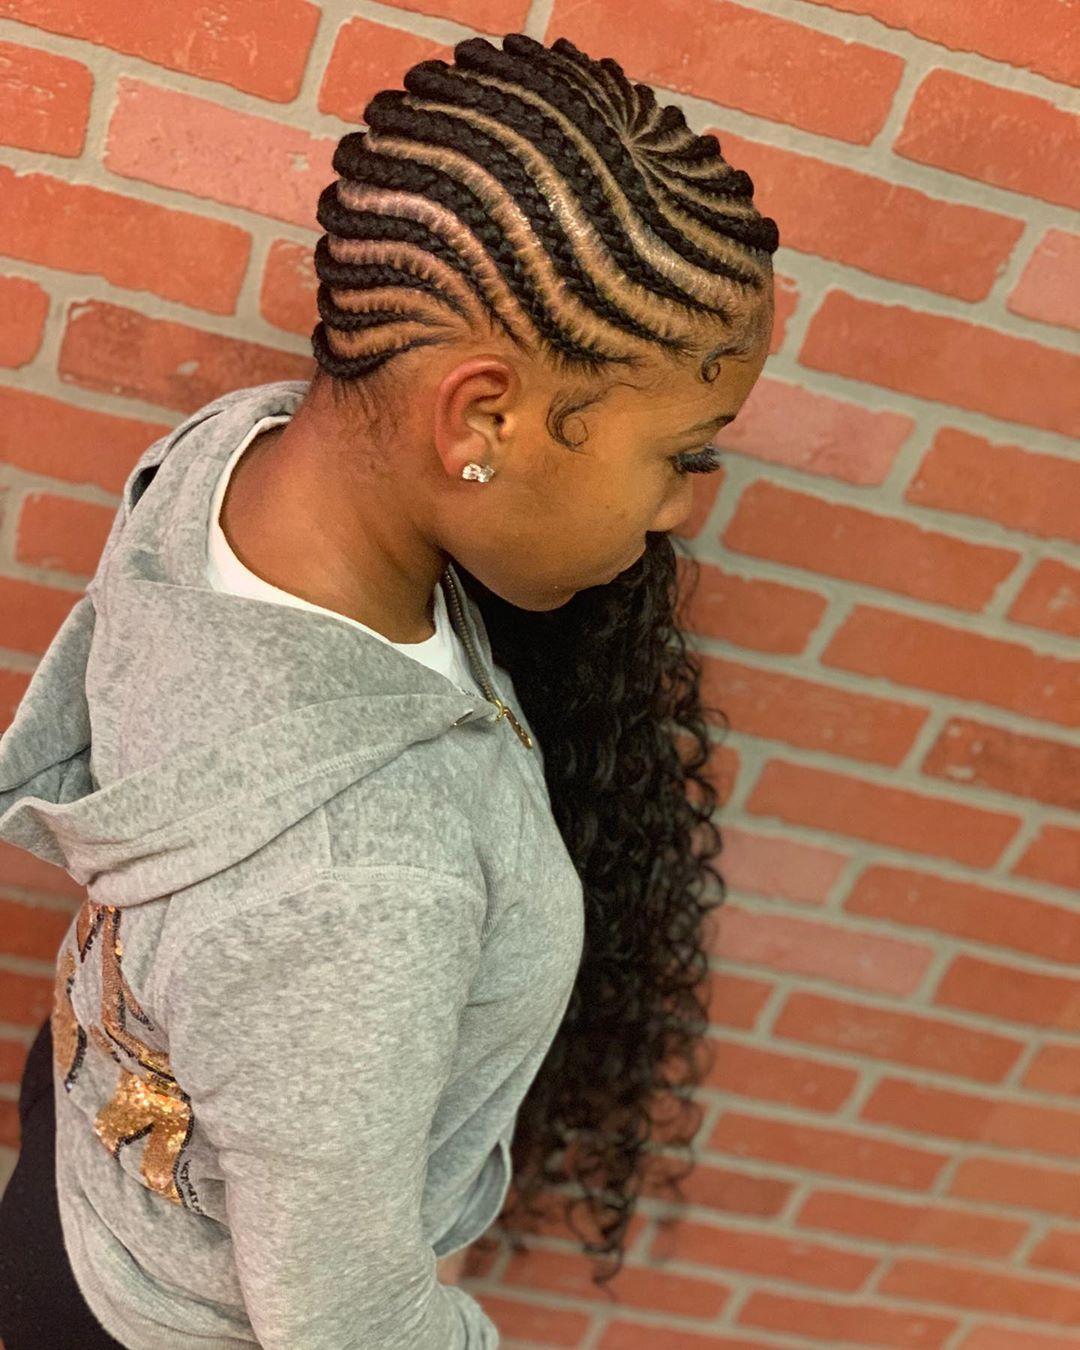 Dabraidway On Instagram Medium Boho S Lemonadebraids Lemonadebraids African Braids Hairstyles Braids With Curls Lemonade Braids Hairstyles